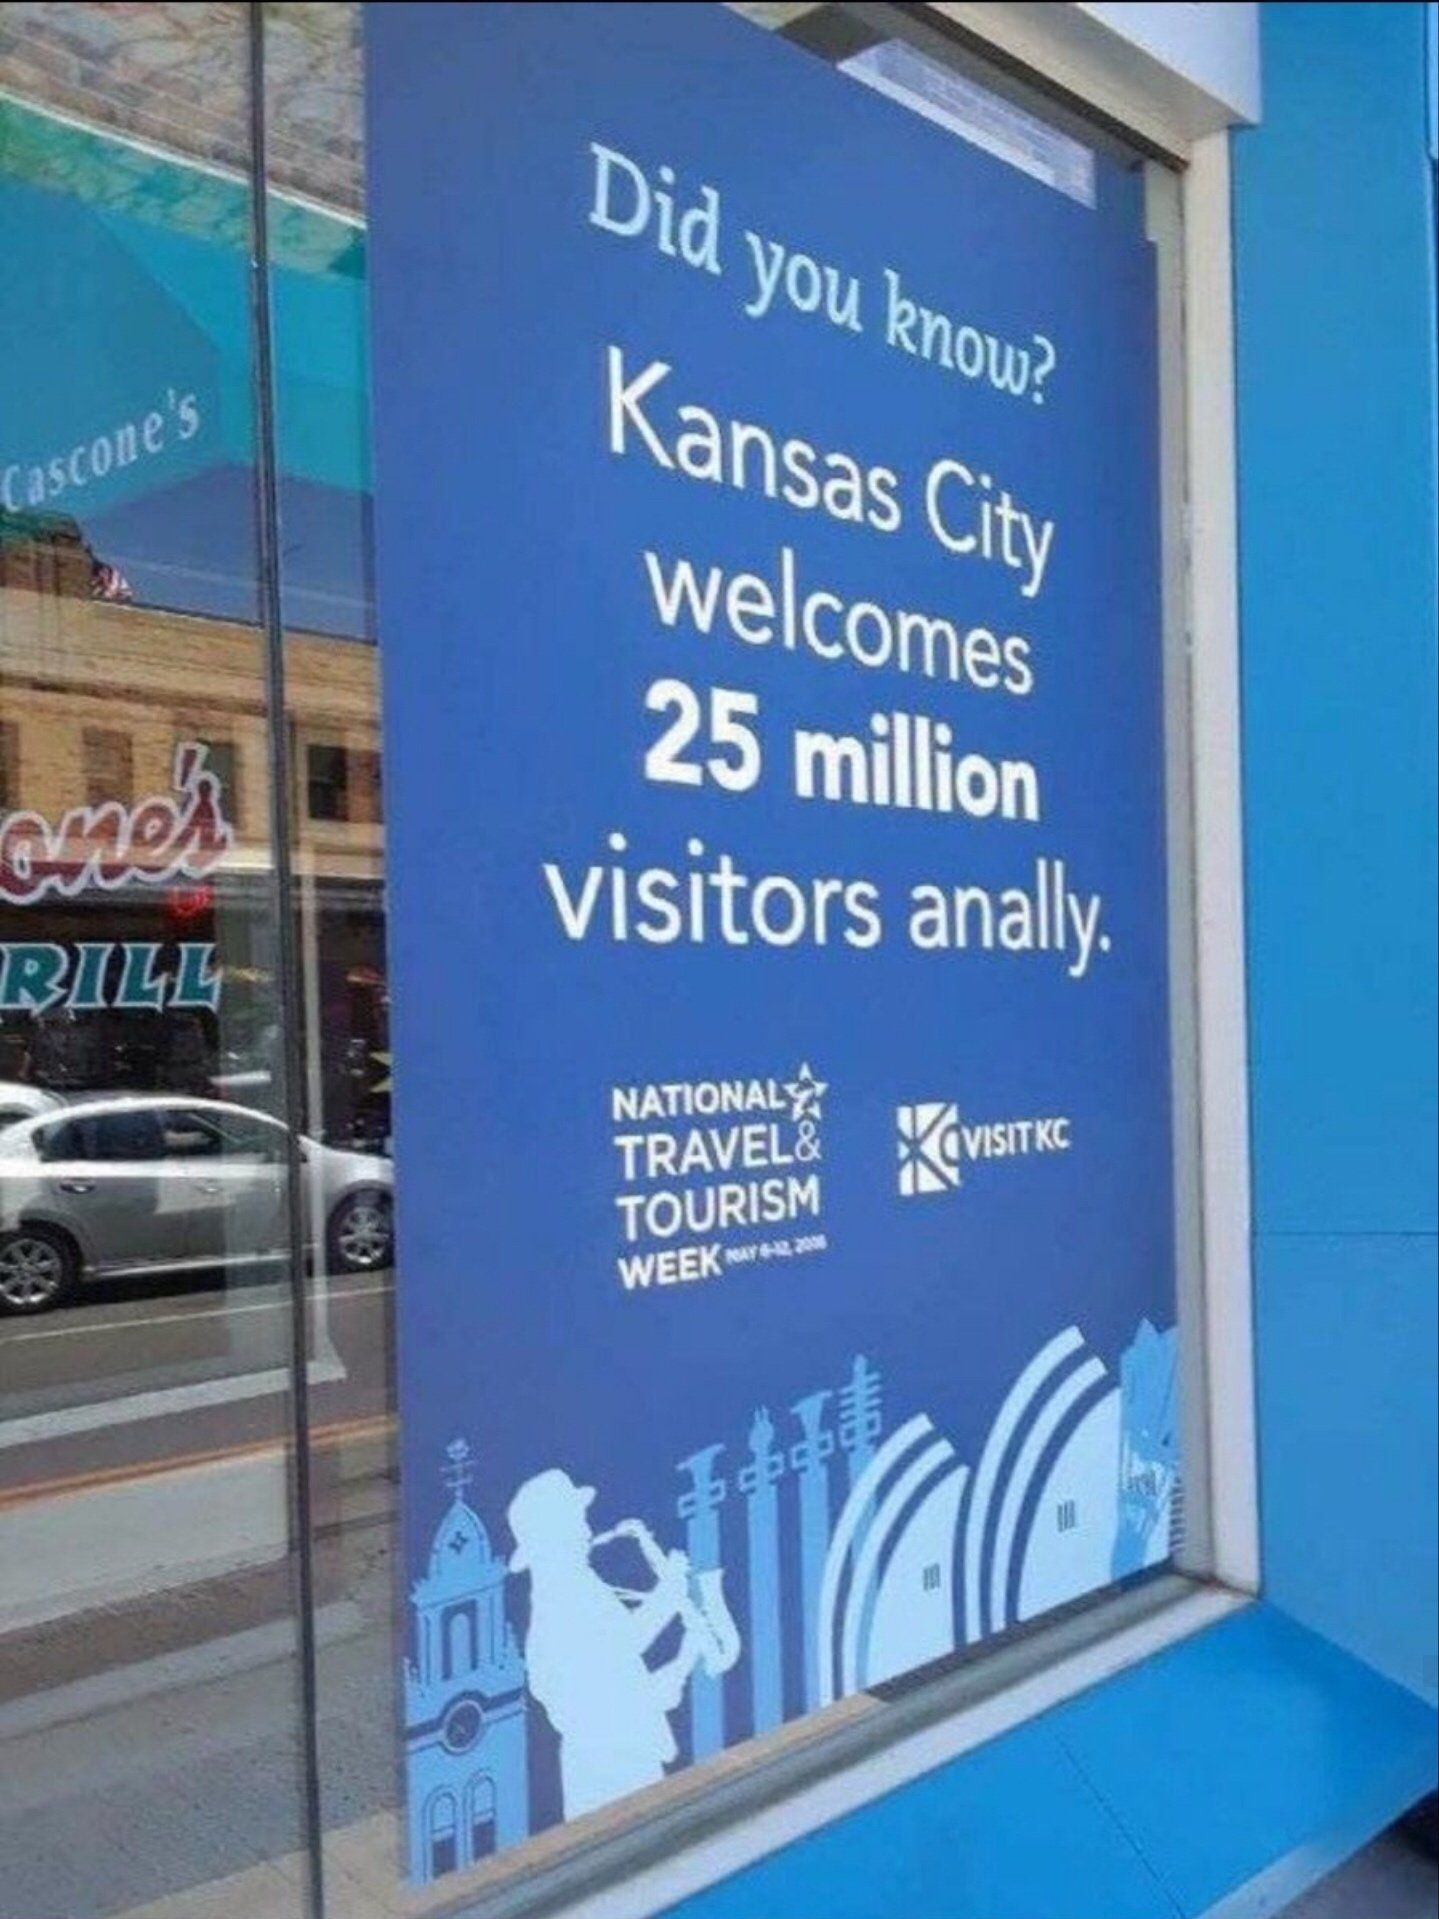 Thats a lot... kansas city is a ***!